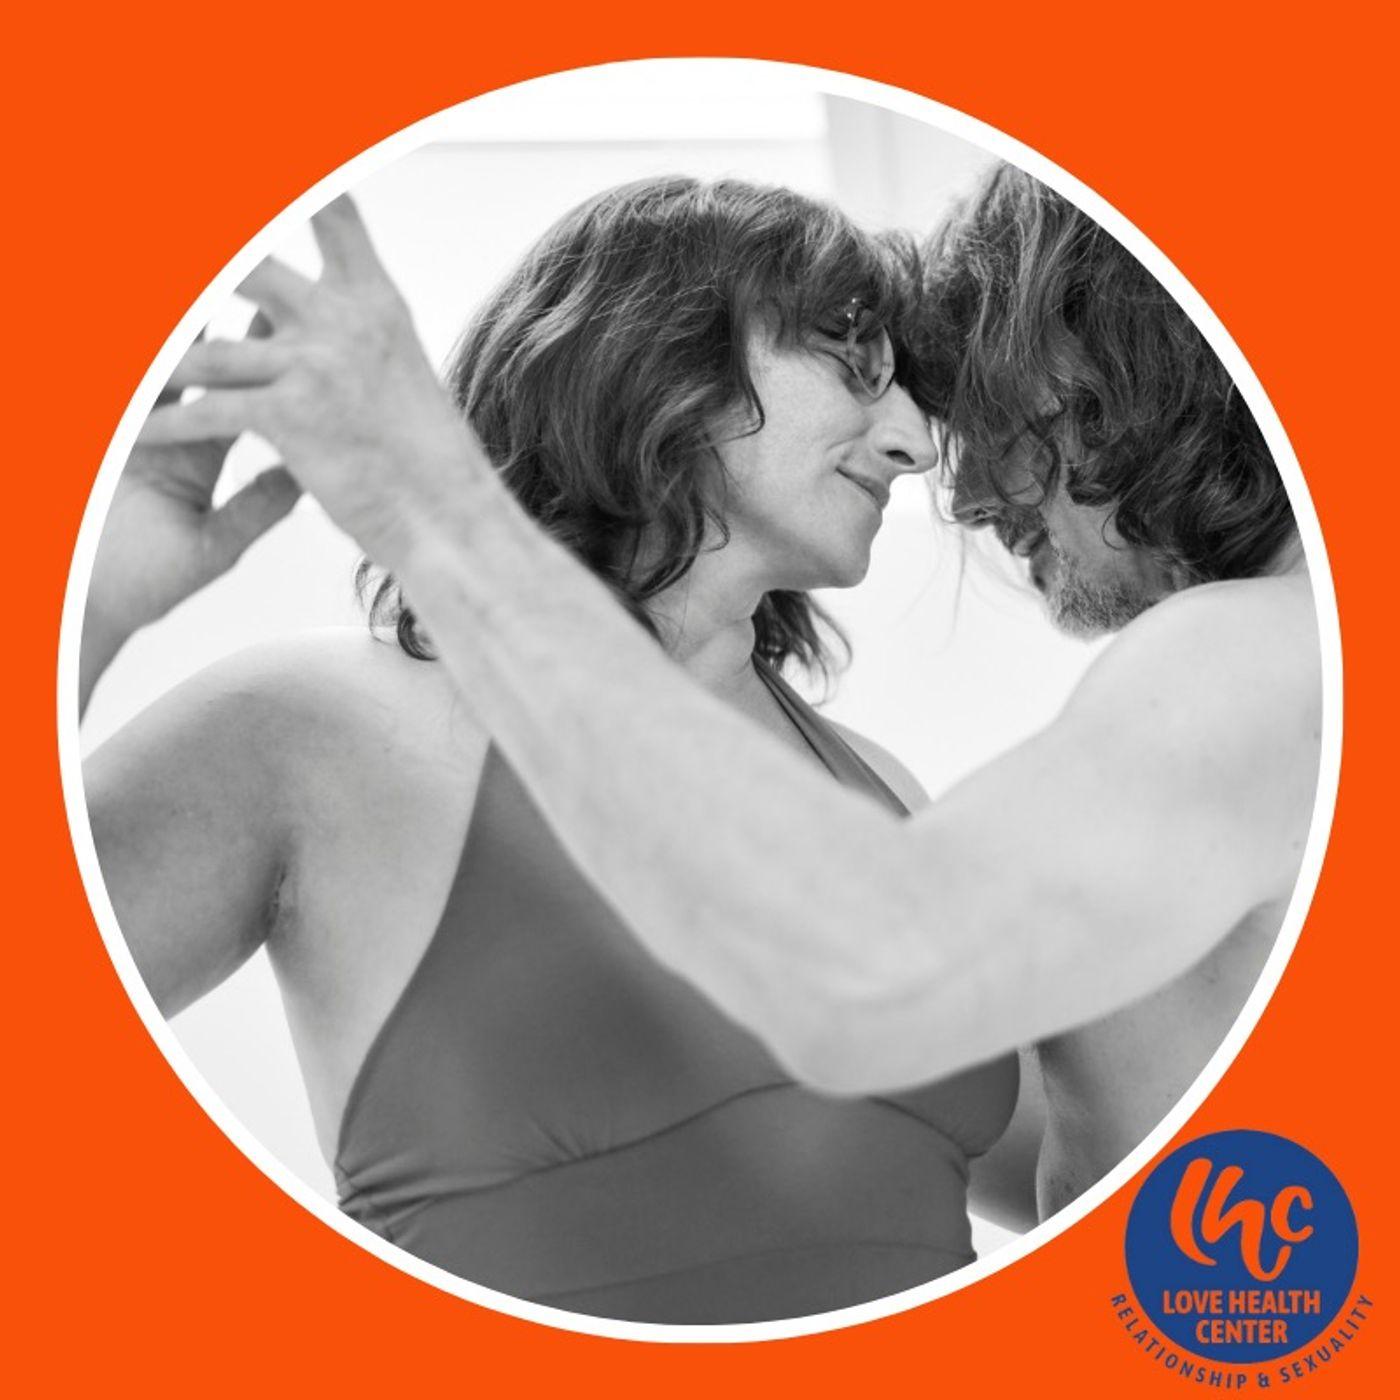 #11 - Body Love Experience (FR)